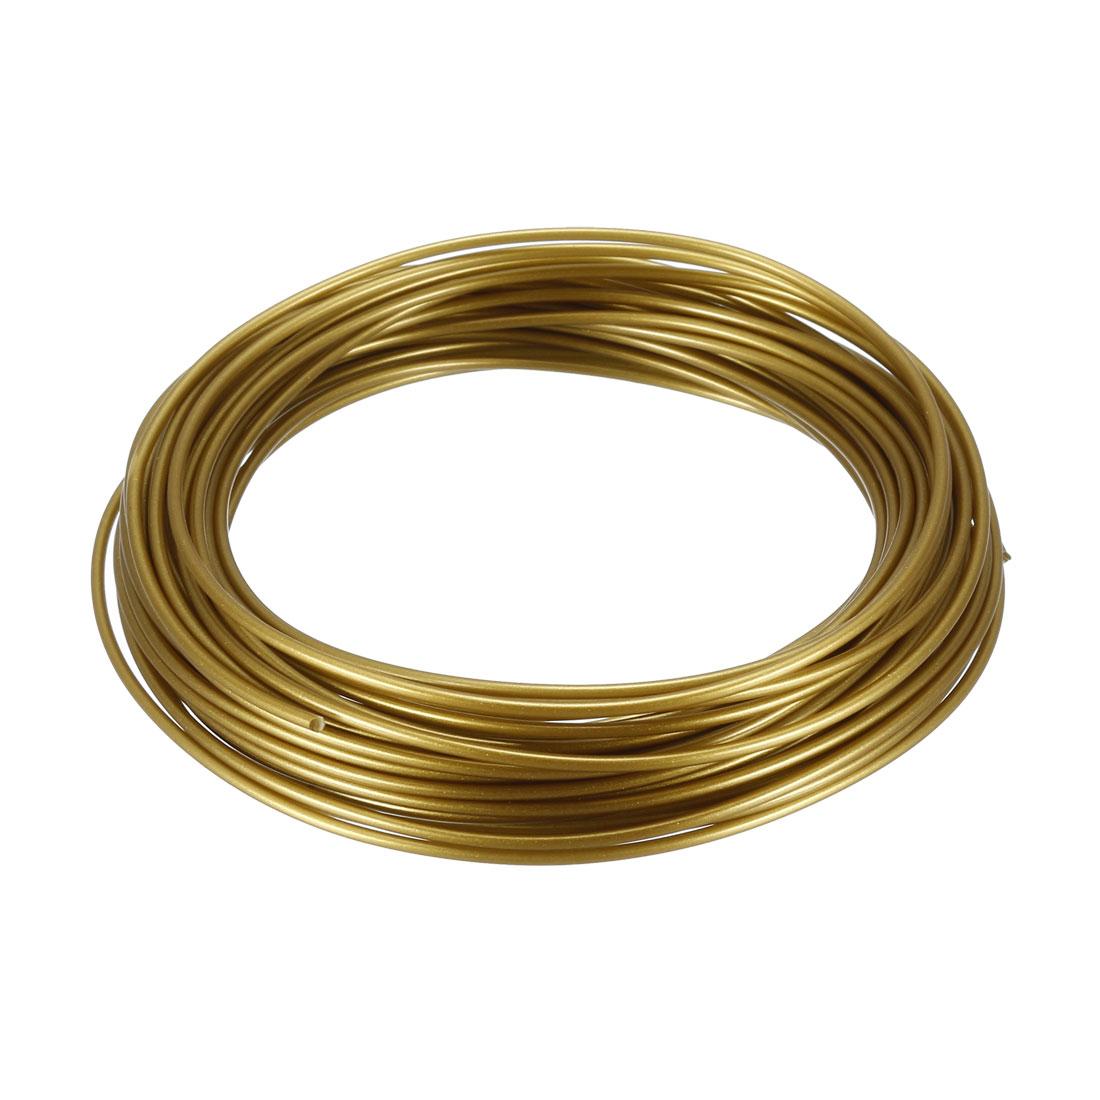 10 Meter/32.5 Ft PLA 3D Pen/3D Printer Filament, 1.75 mm Navy Golden